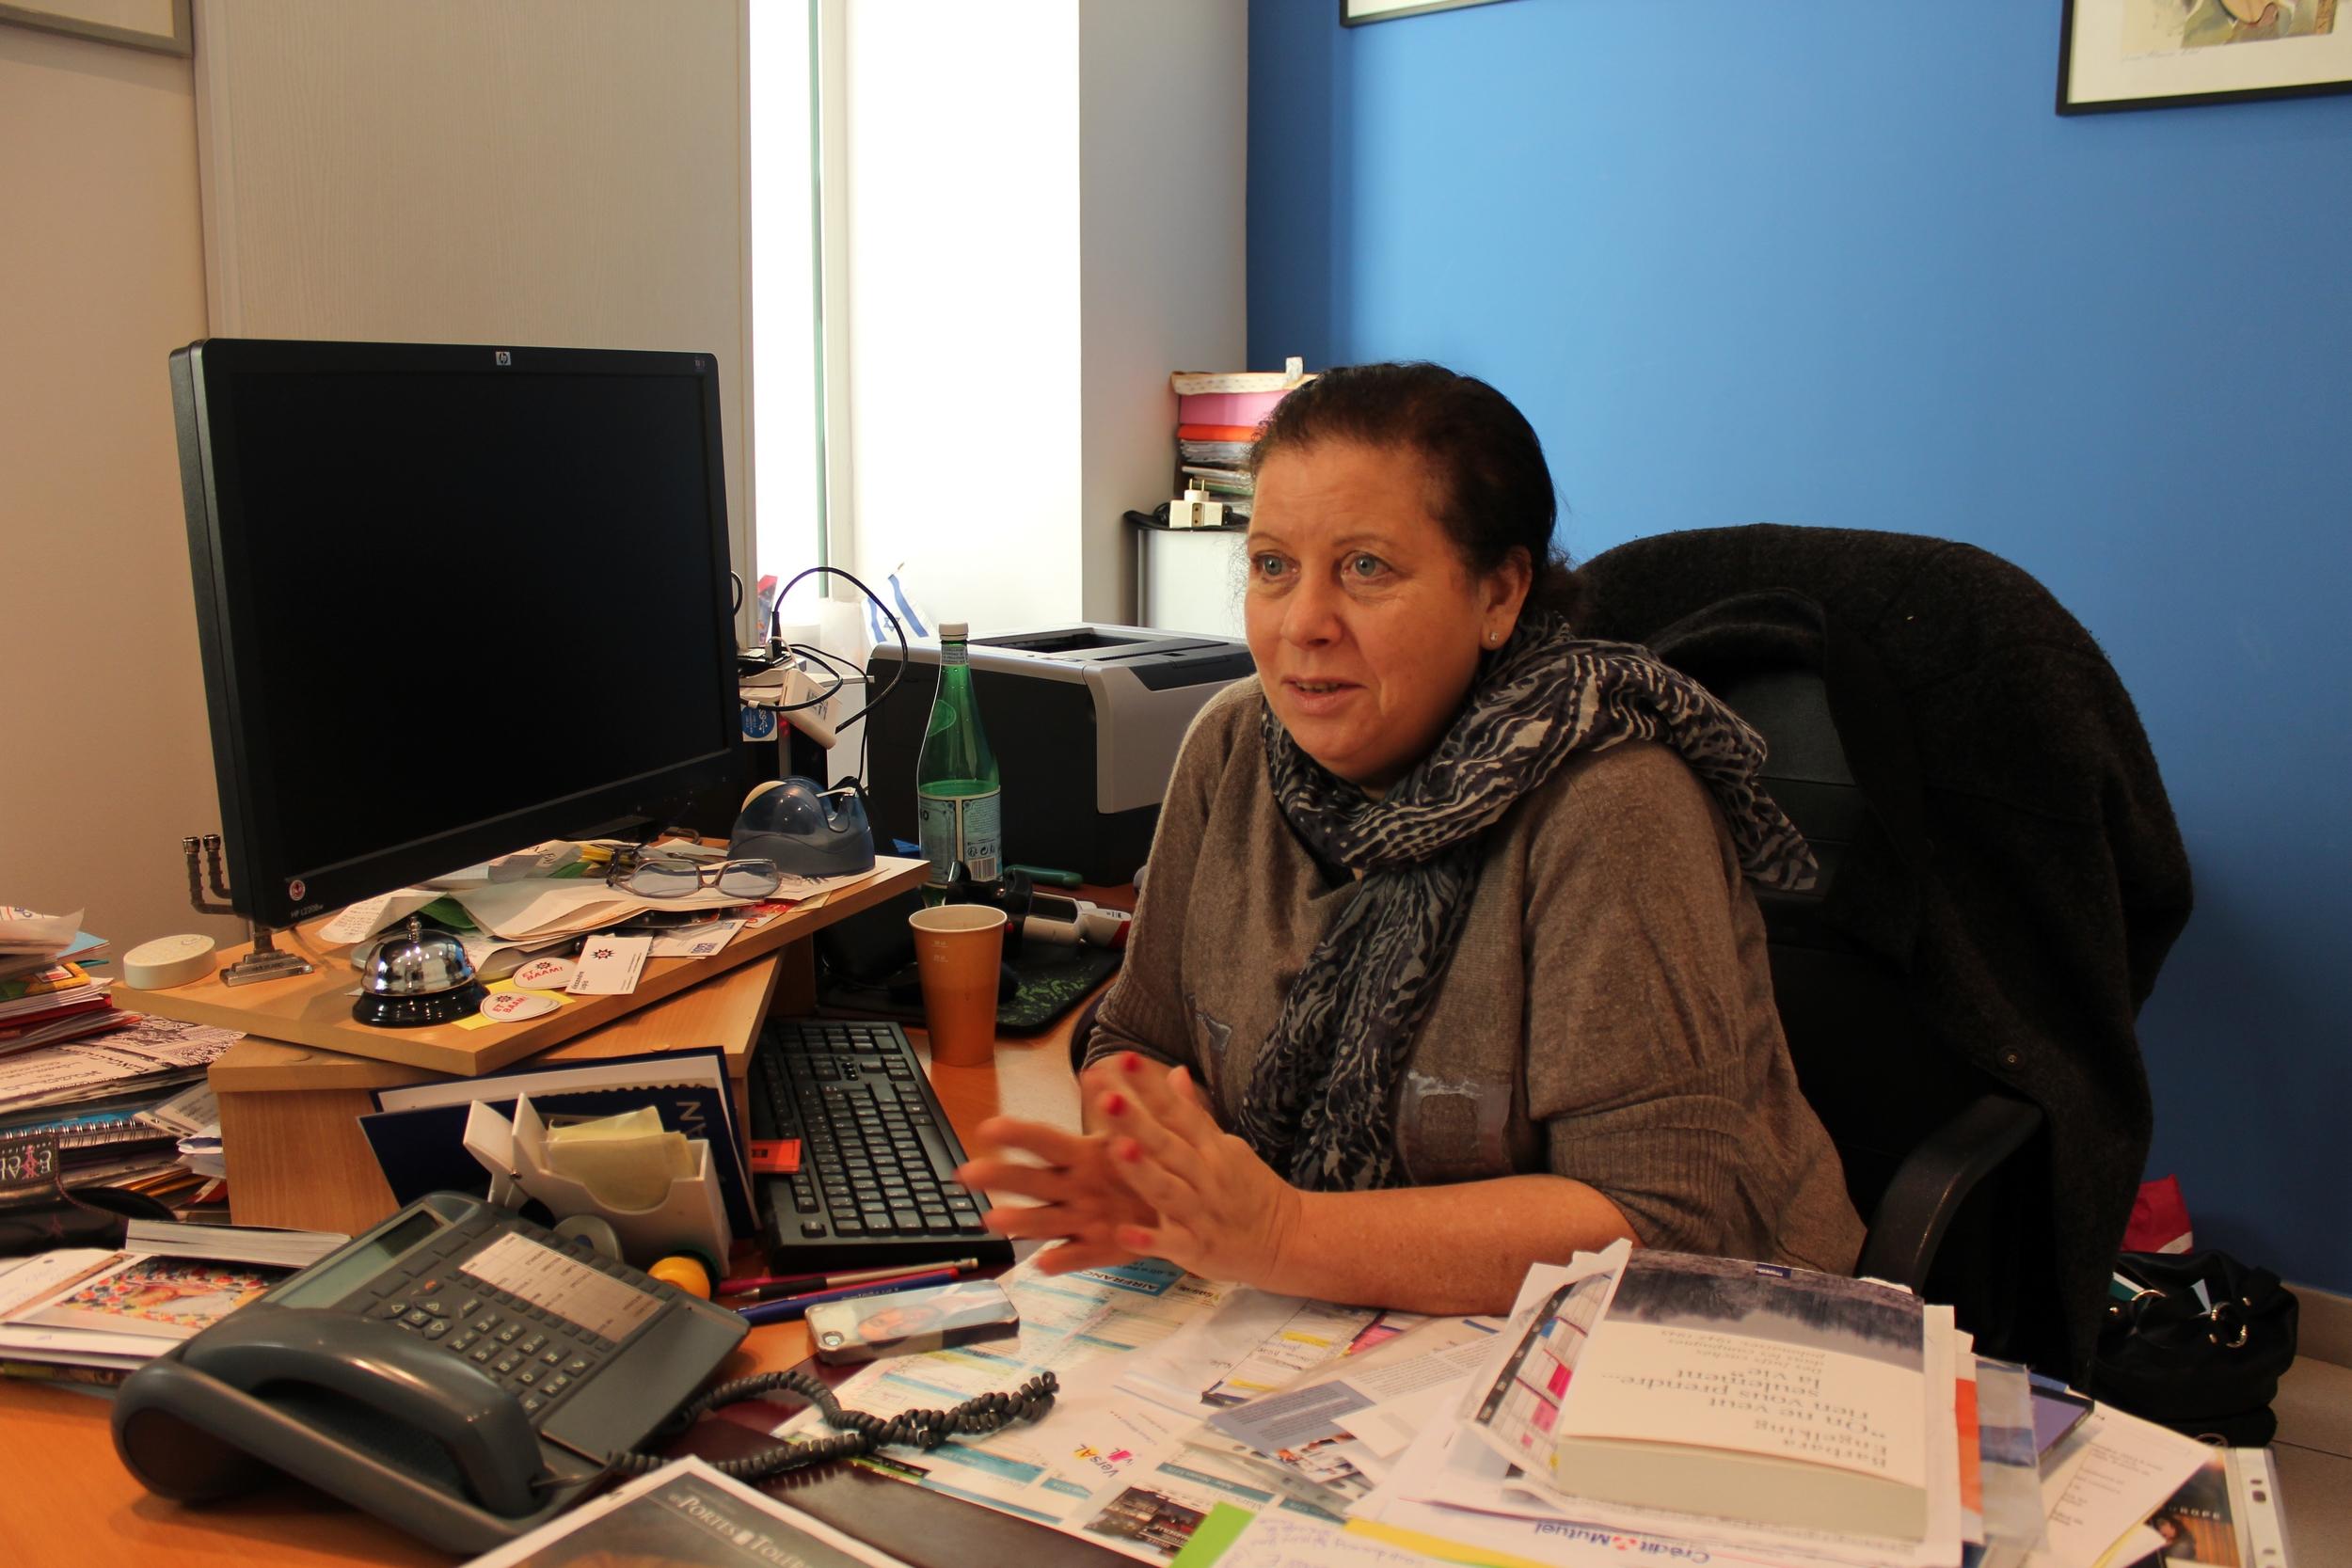 Martine Yana dans son bureau au Centre Edmond Fleg. ©AL